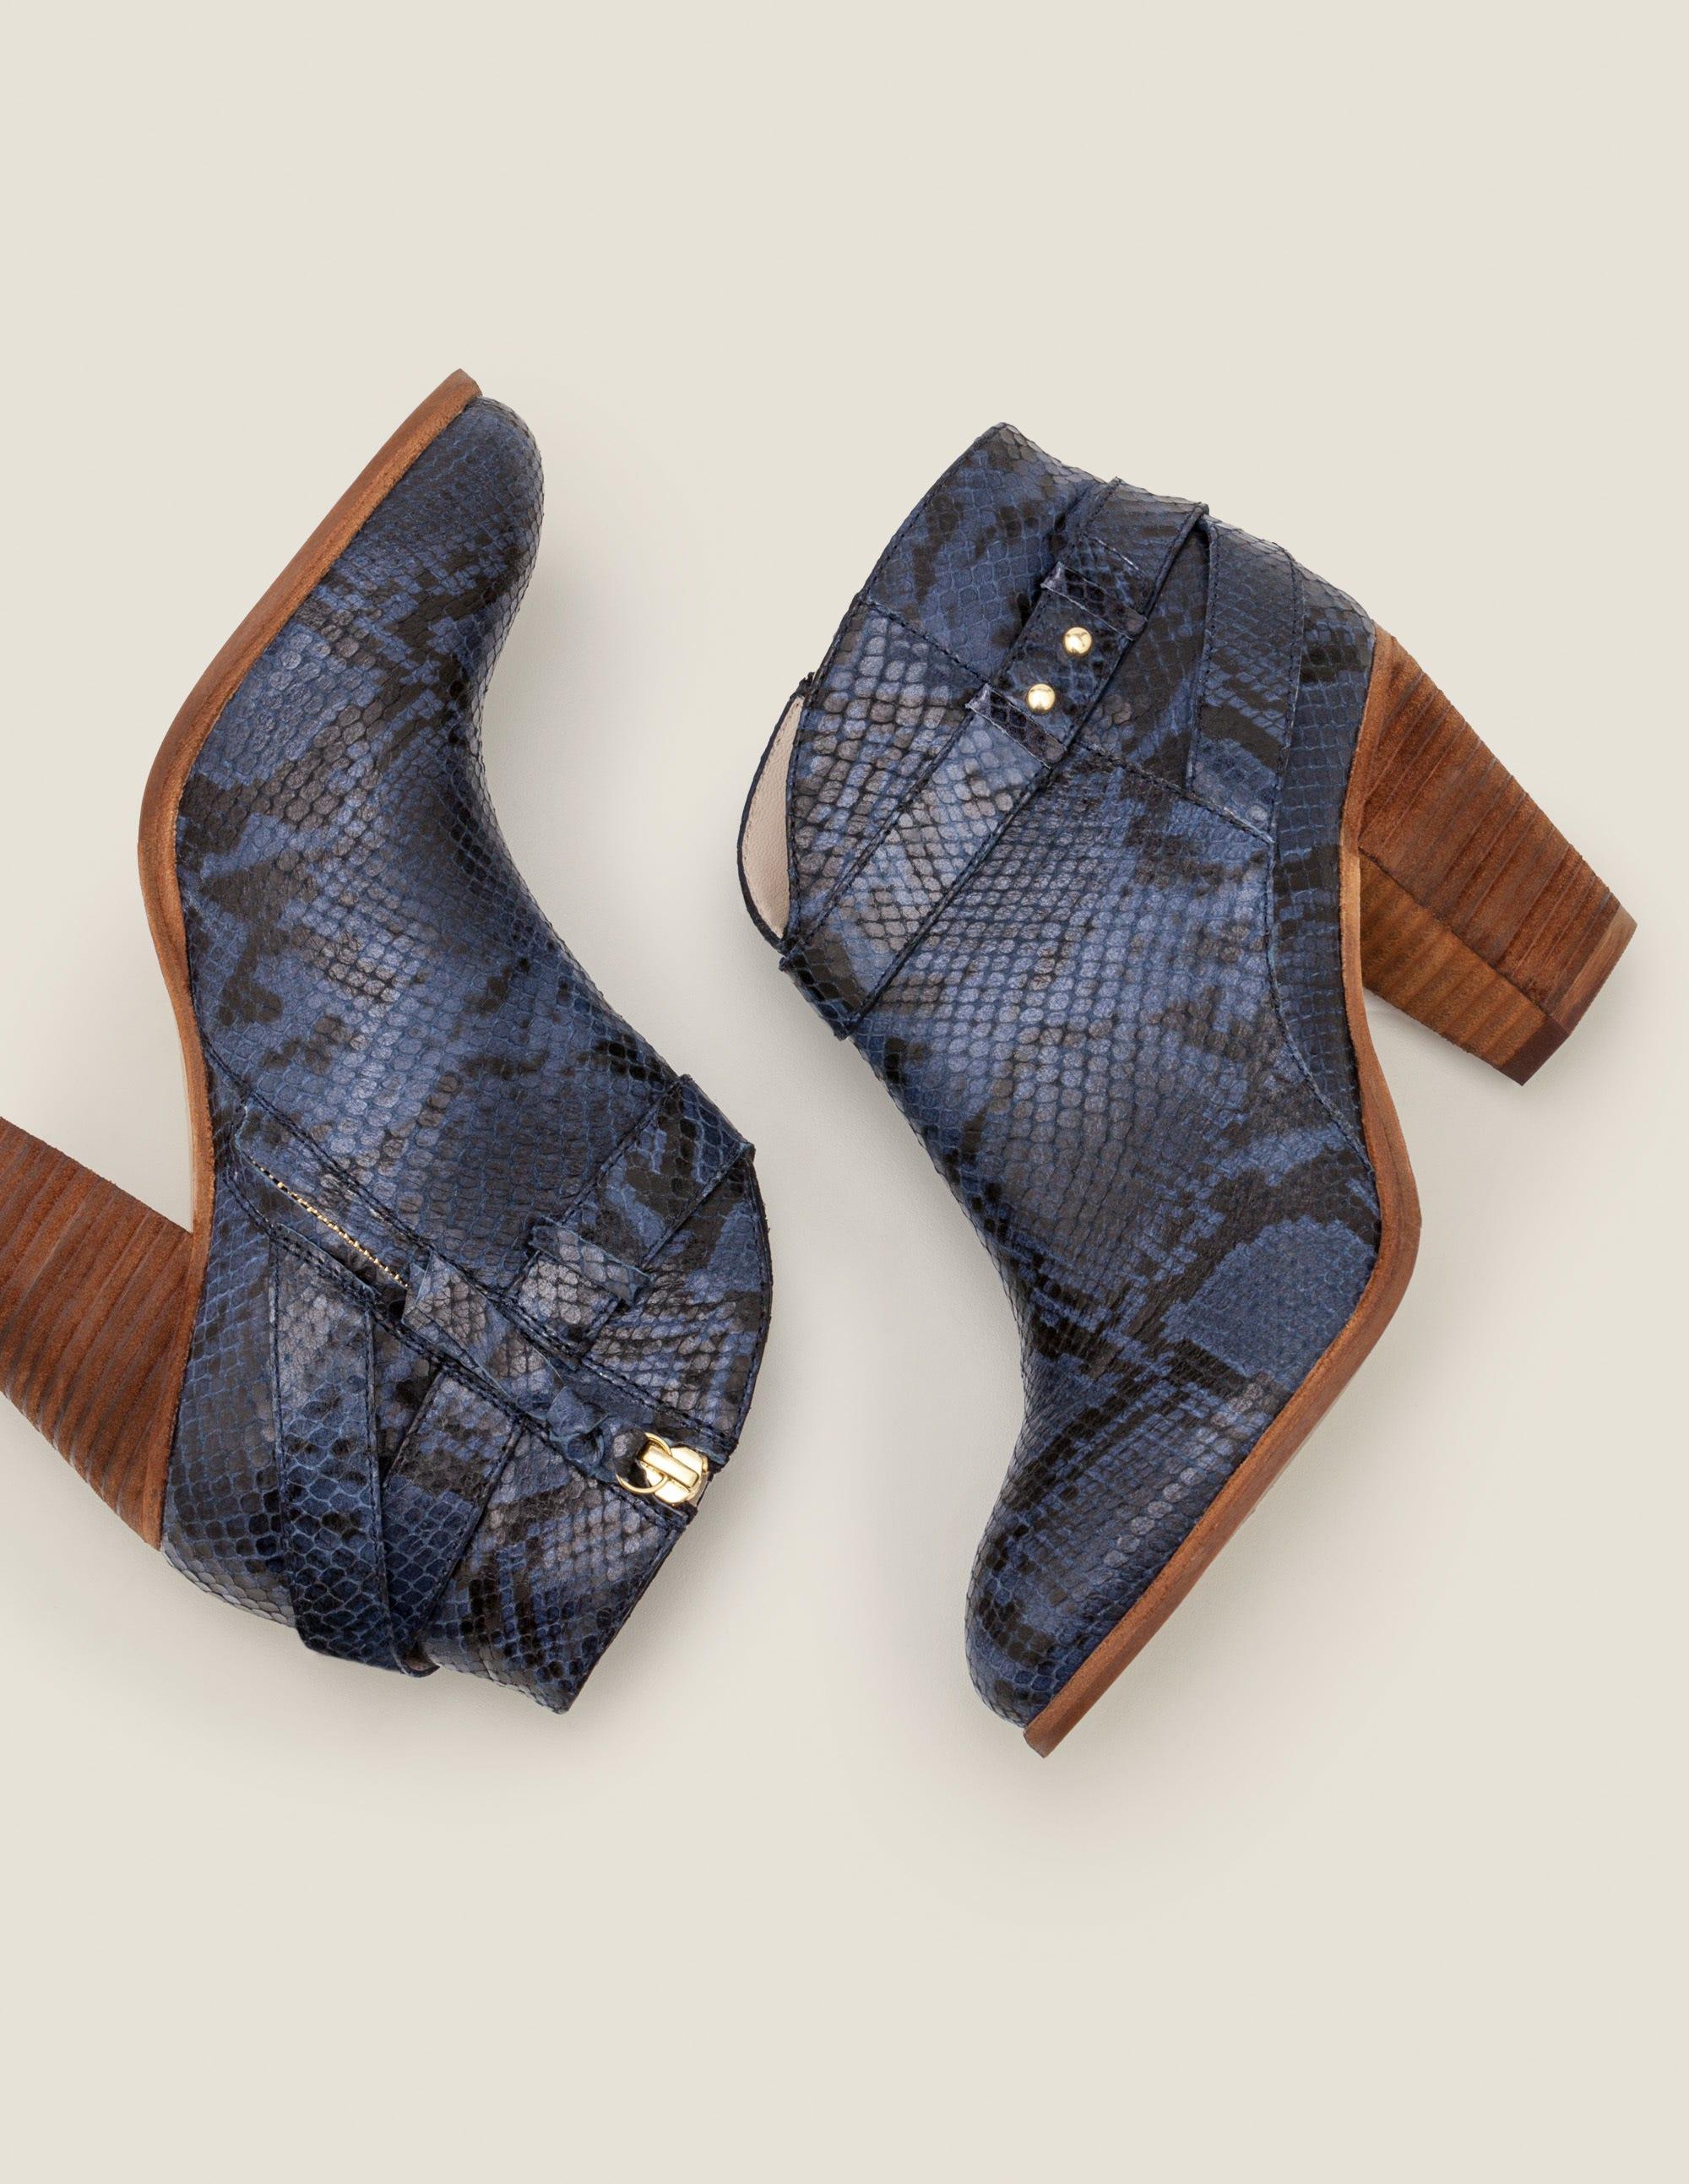 Boden Stratford Ankle Boots - Navy Snake